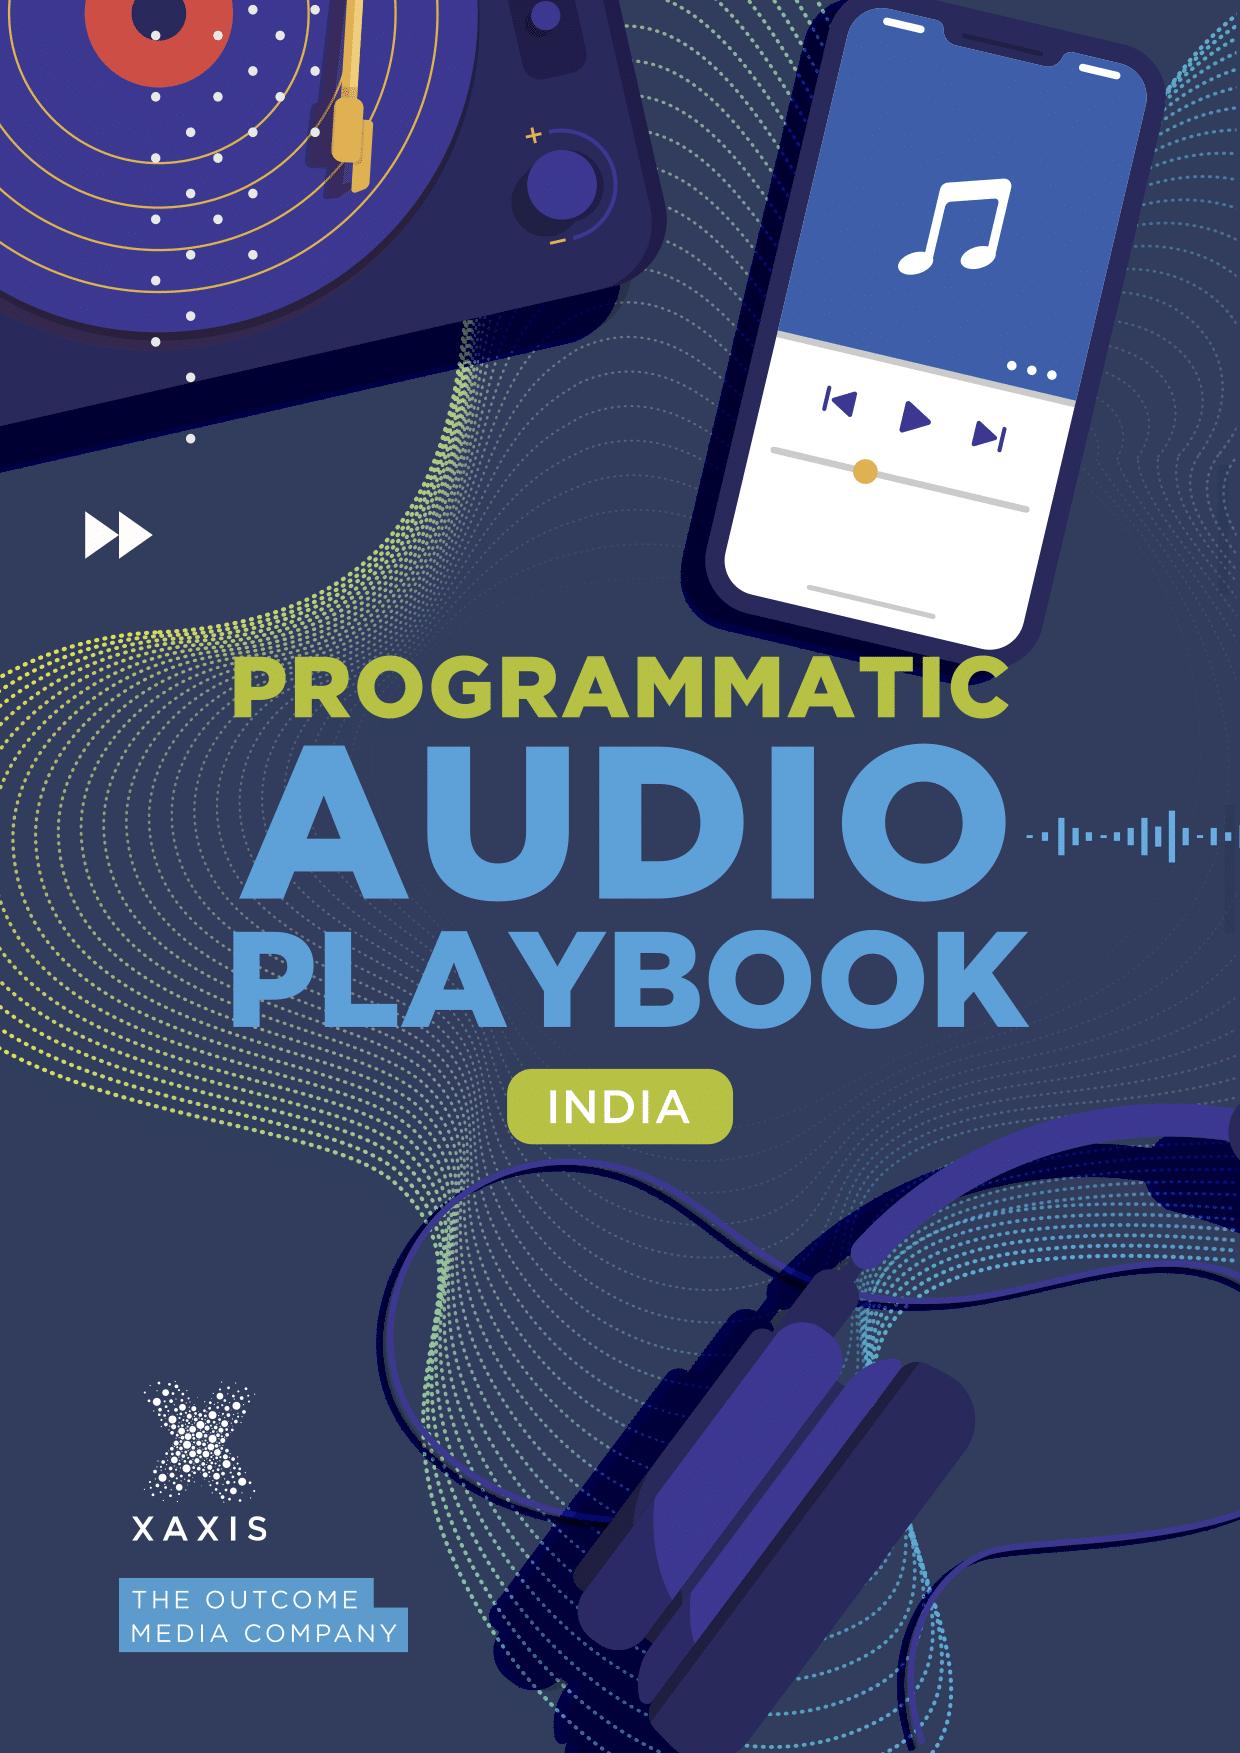 India's Programmatic Audio Playbook